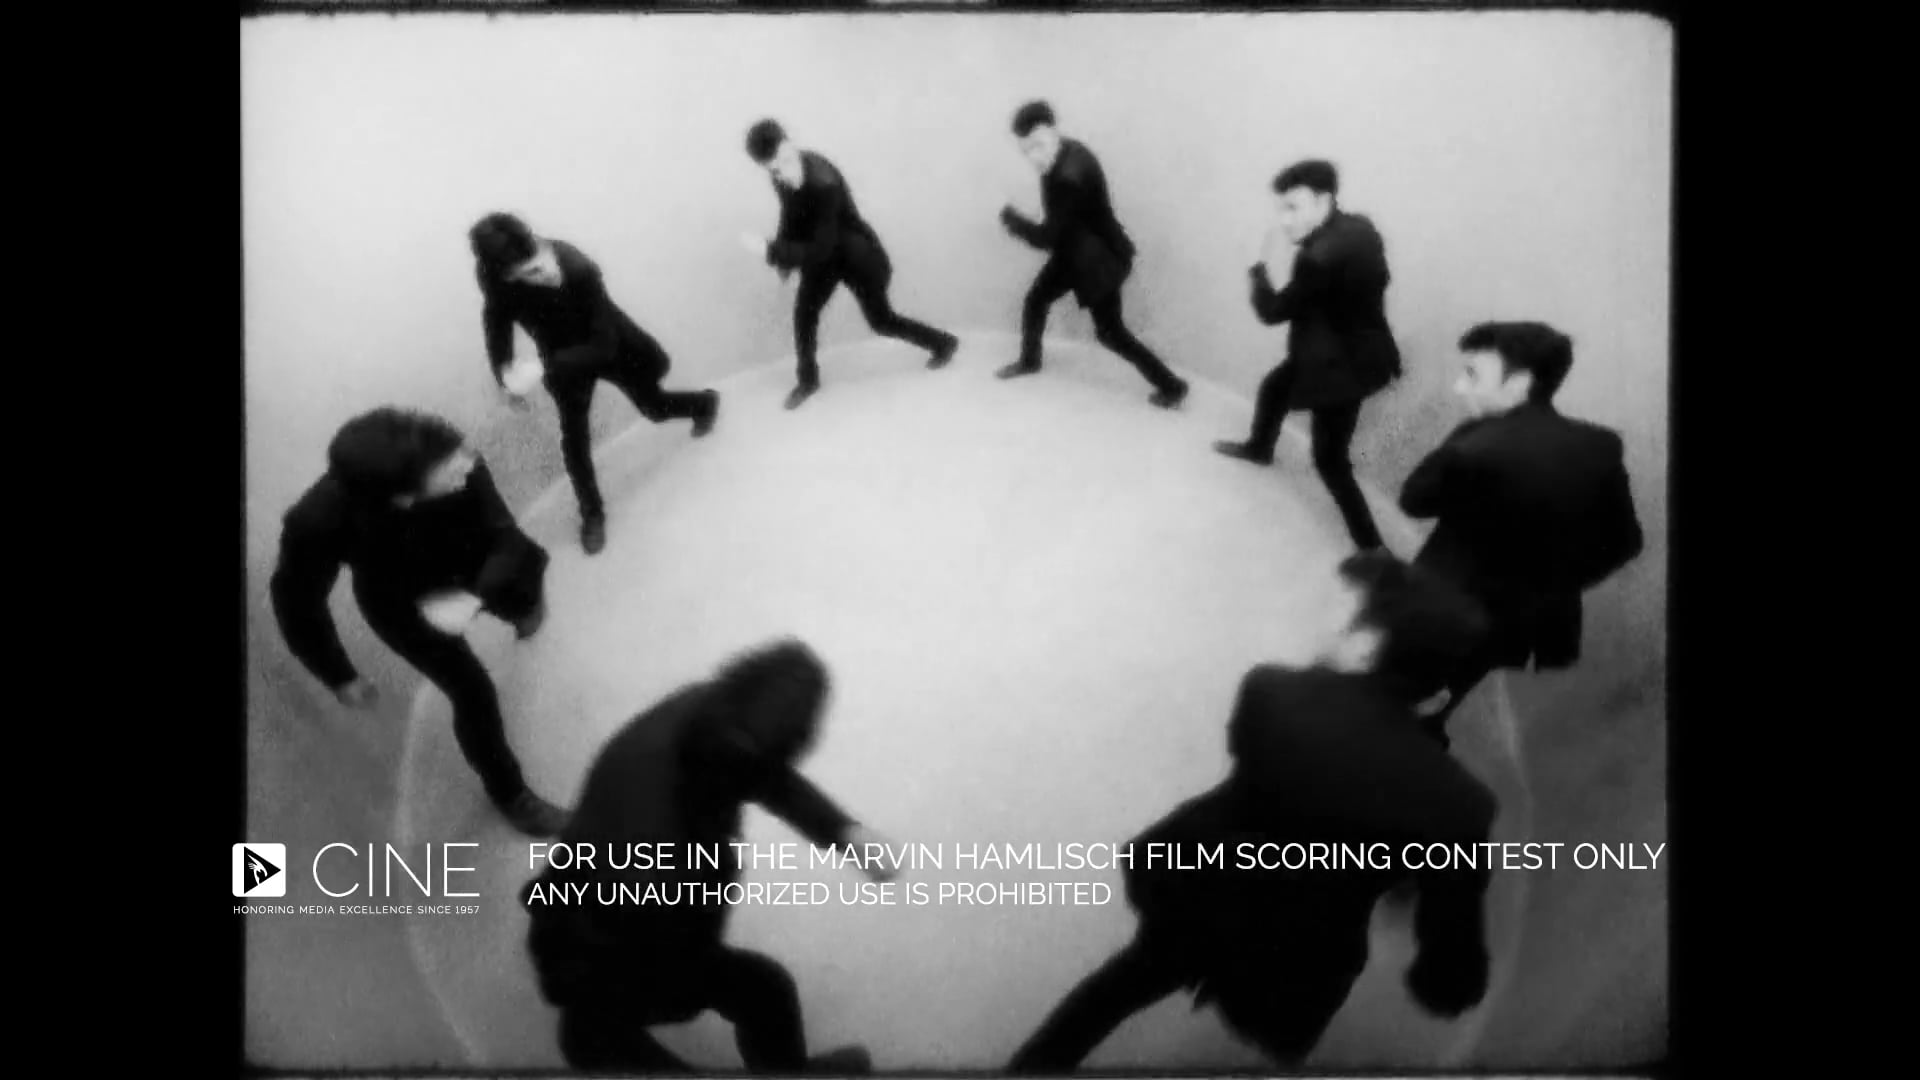 One Man, Eight Cameras - Score by Aija Alsina - 2016 Marvin Hamlisch Film Scoring Contest Finalist